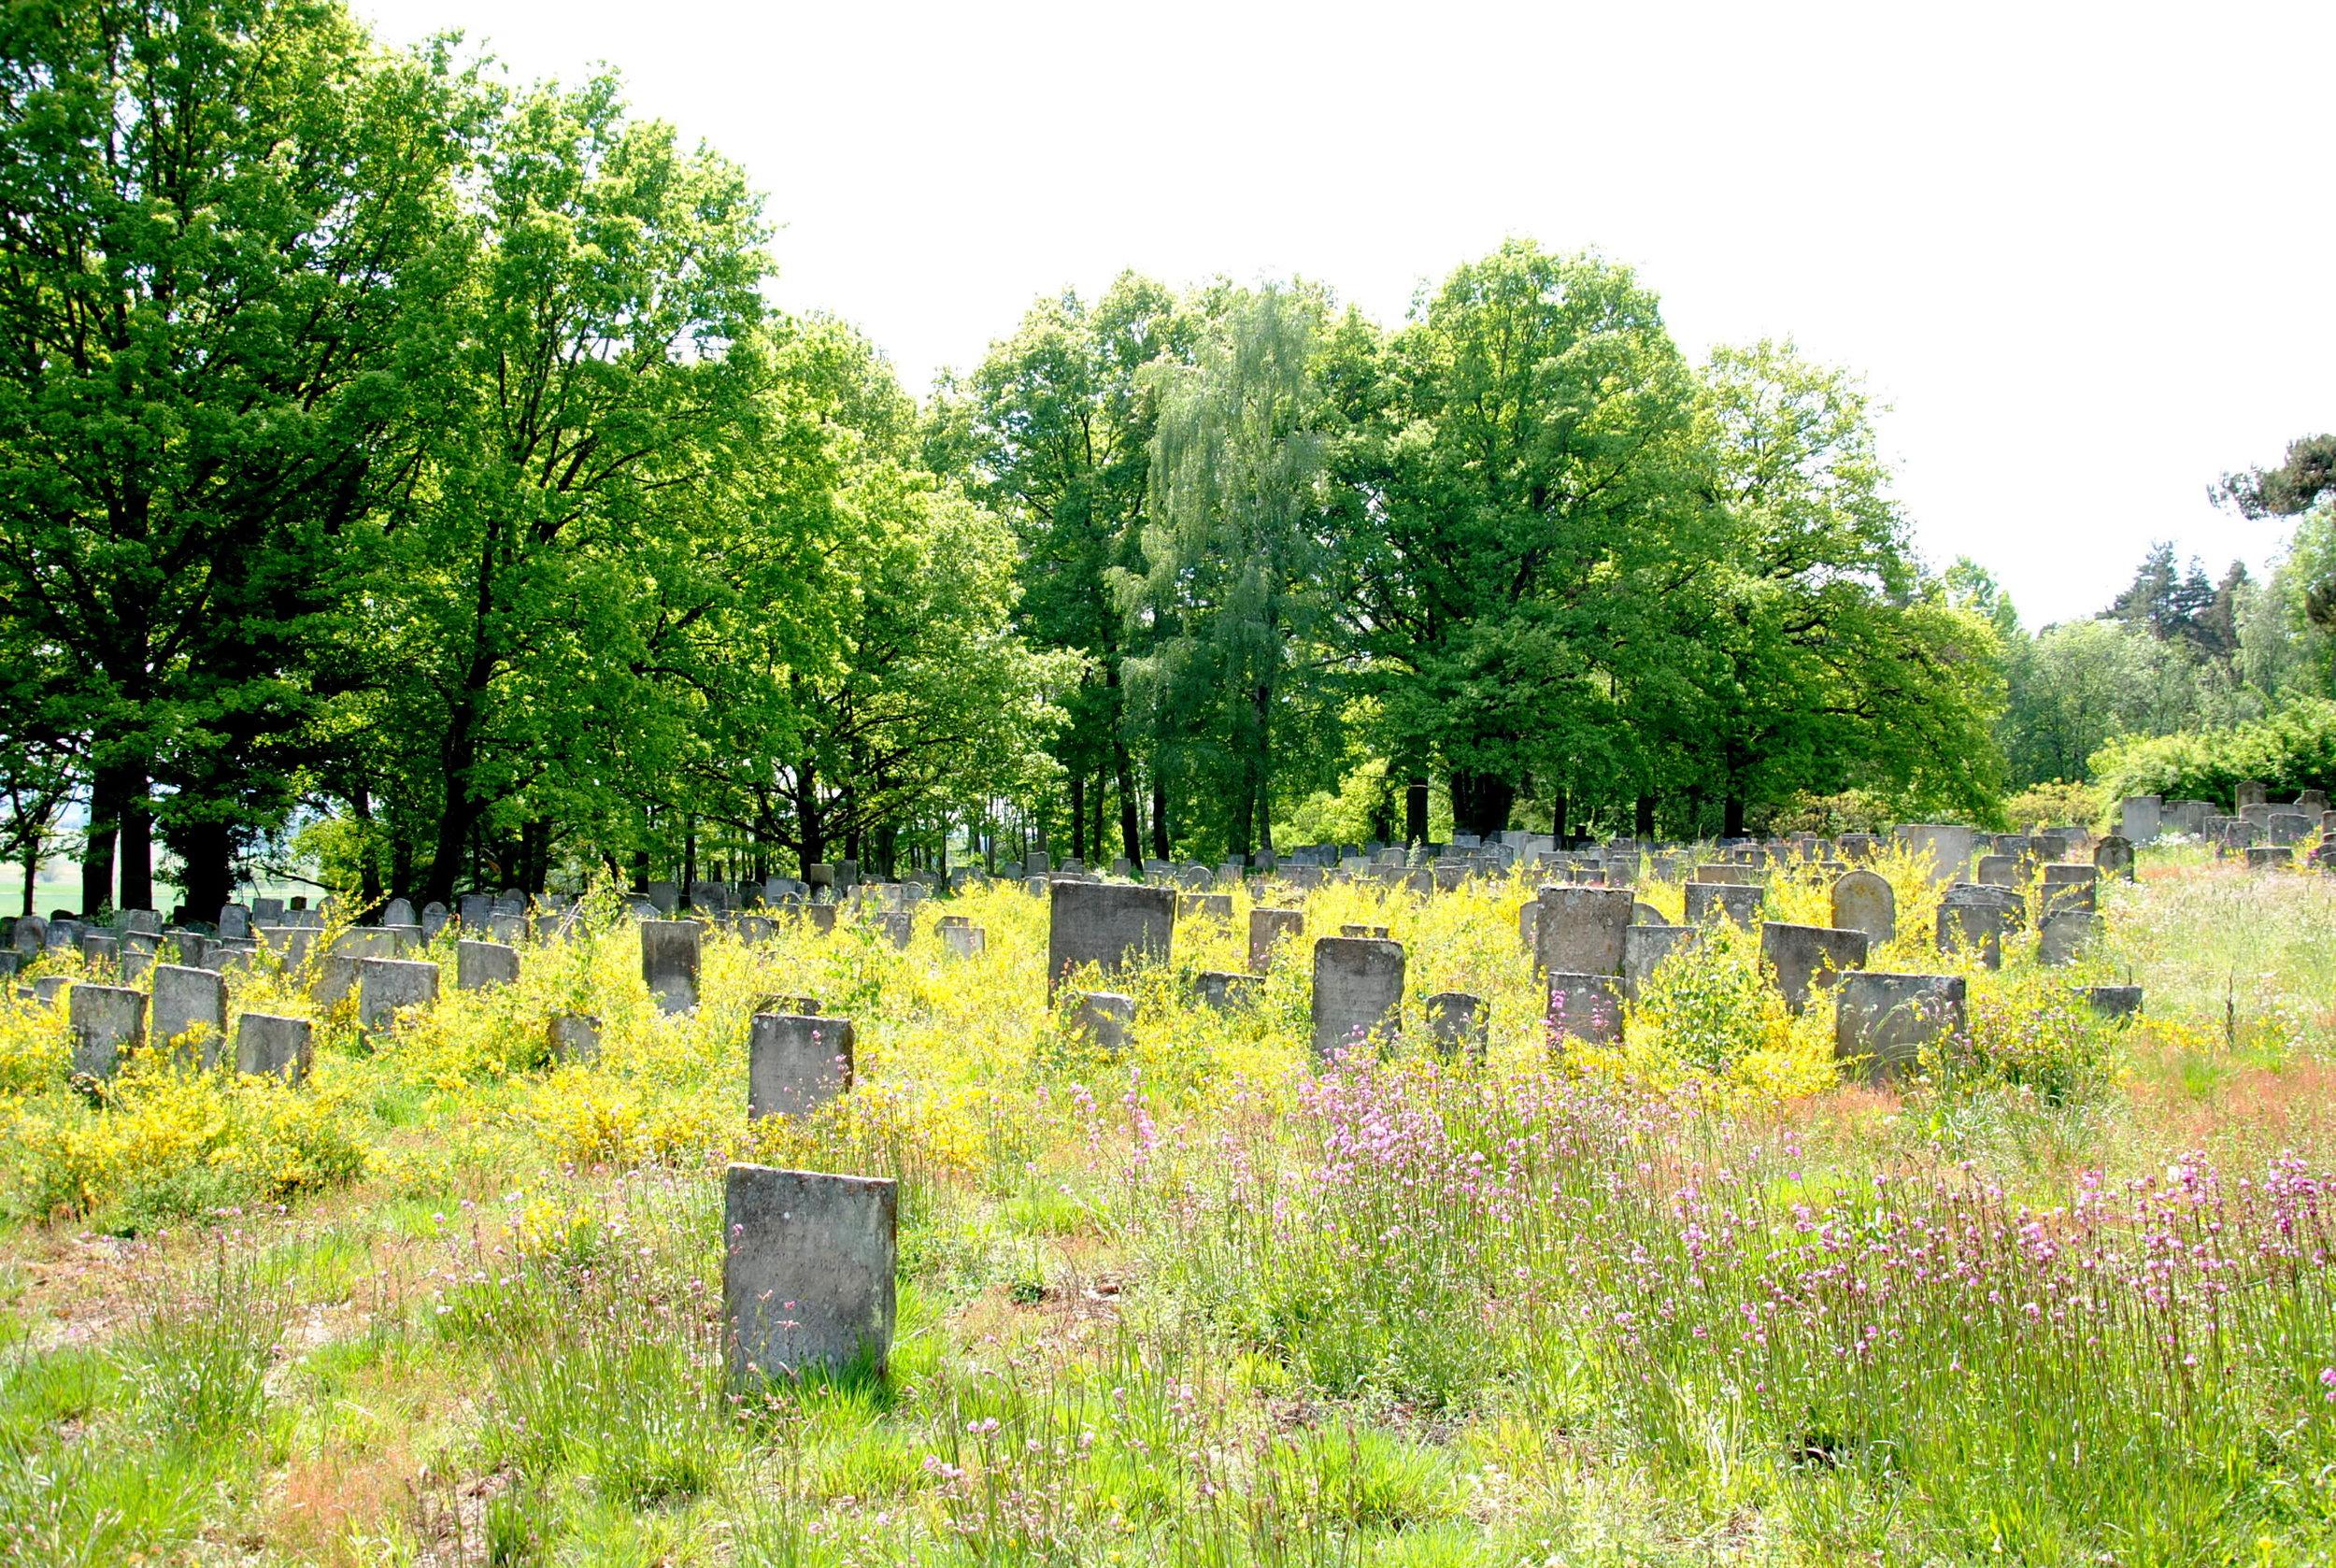 Jüdischer Friedhof Bechhofen. Foto: Claudia Dommel